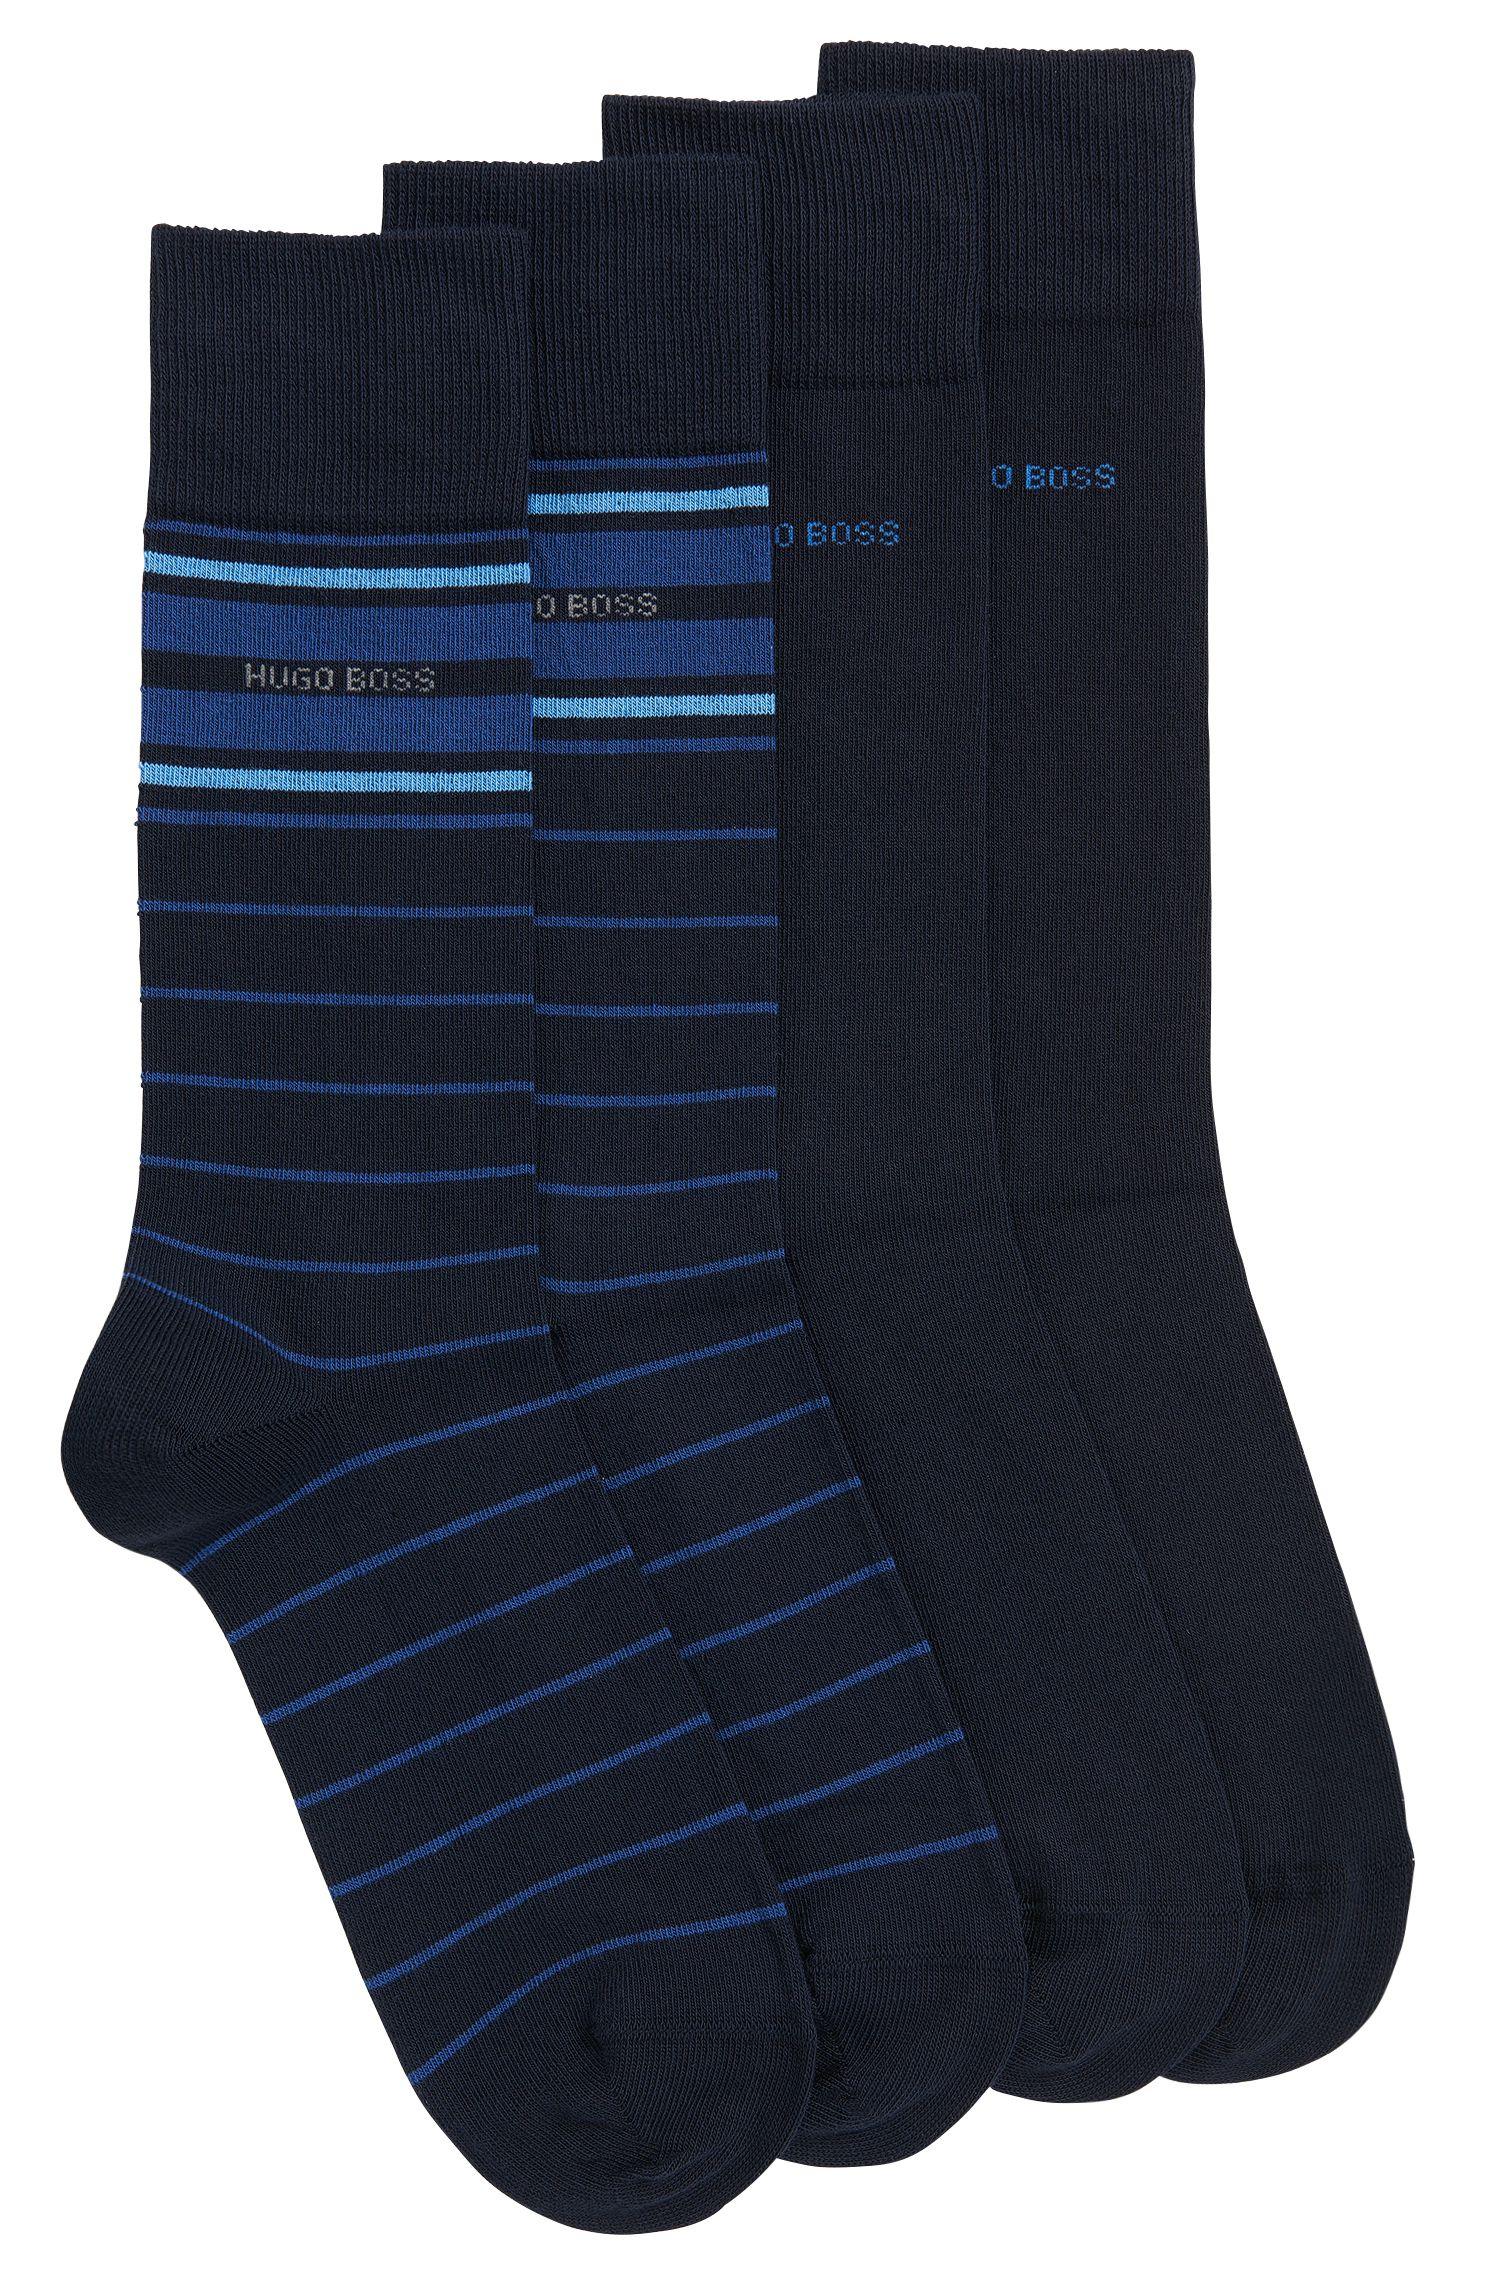 Stretch Cotton Socks, 2 Pack | 2P RS Stripe US CC, Dark Blue